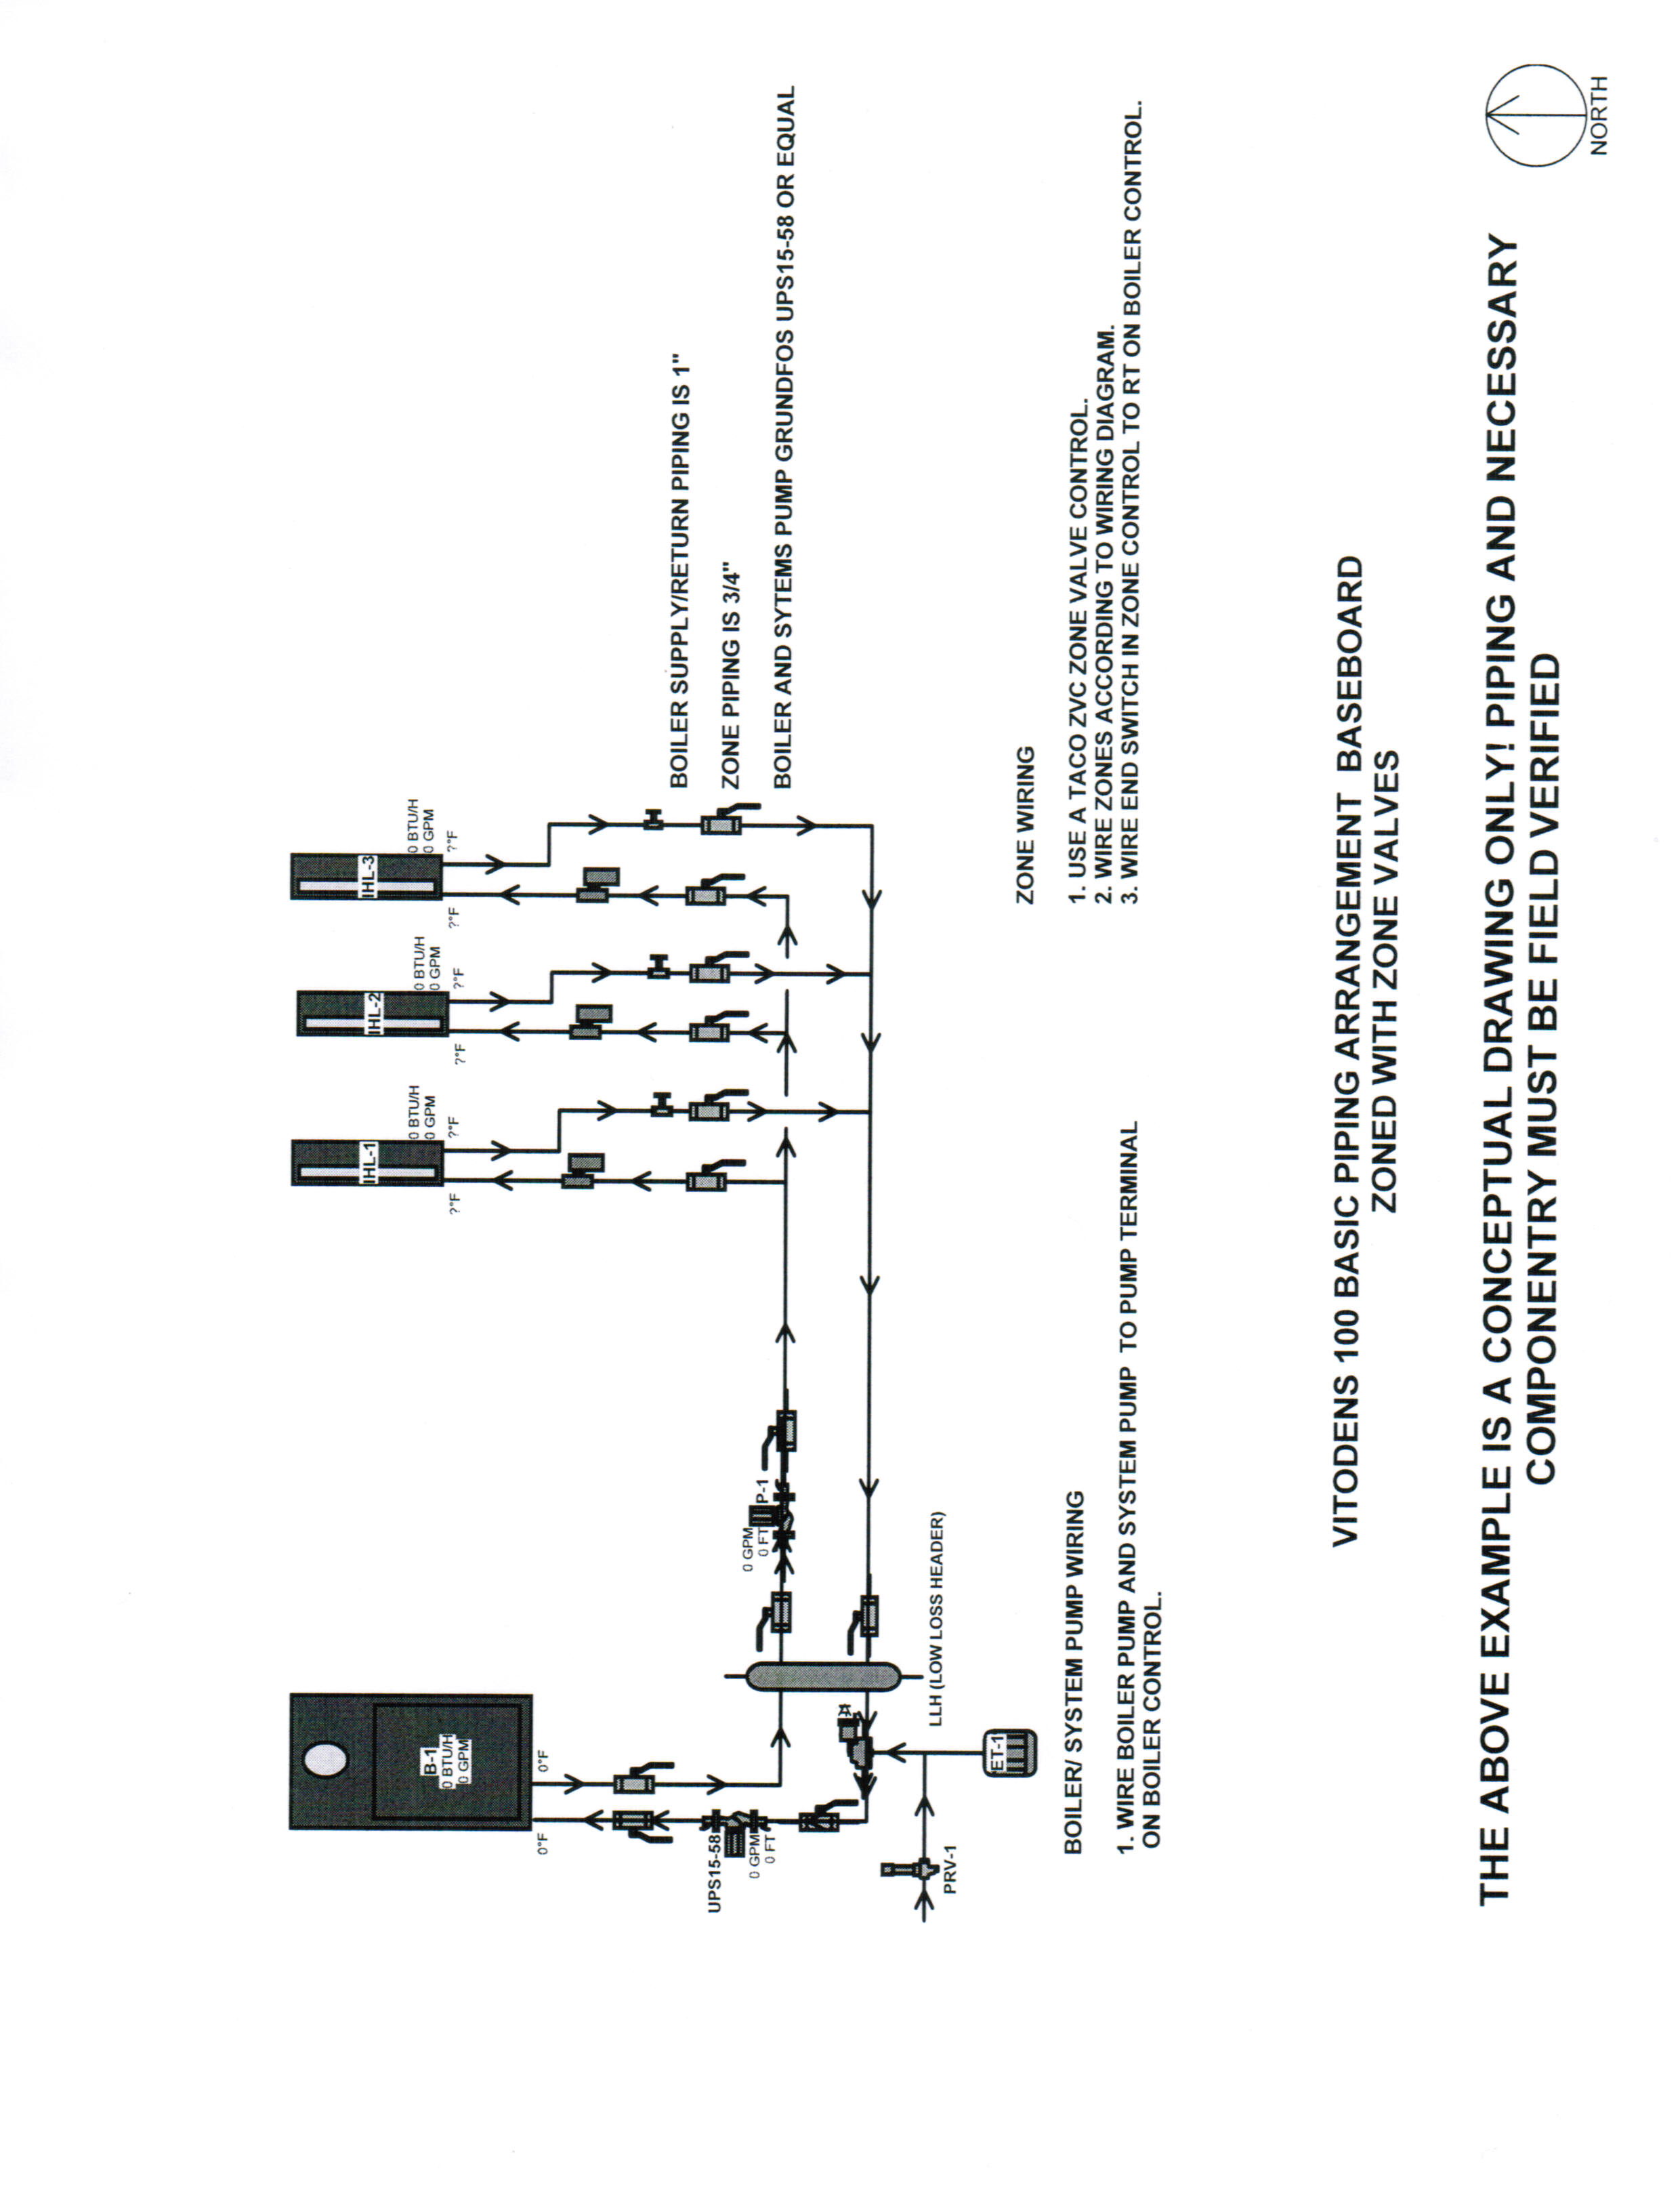 taco 570 zone valve wiring diagram zone free printable wiring diagrams